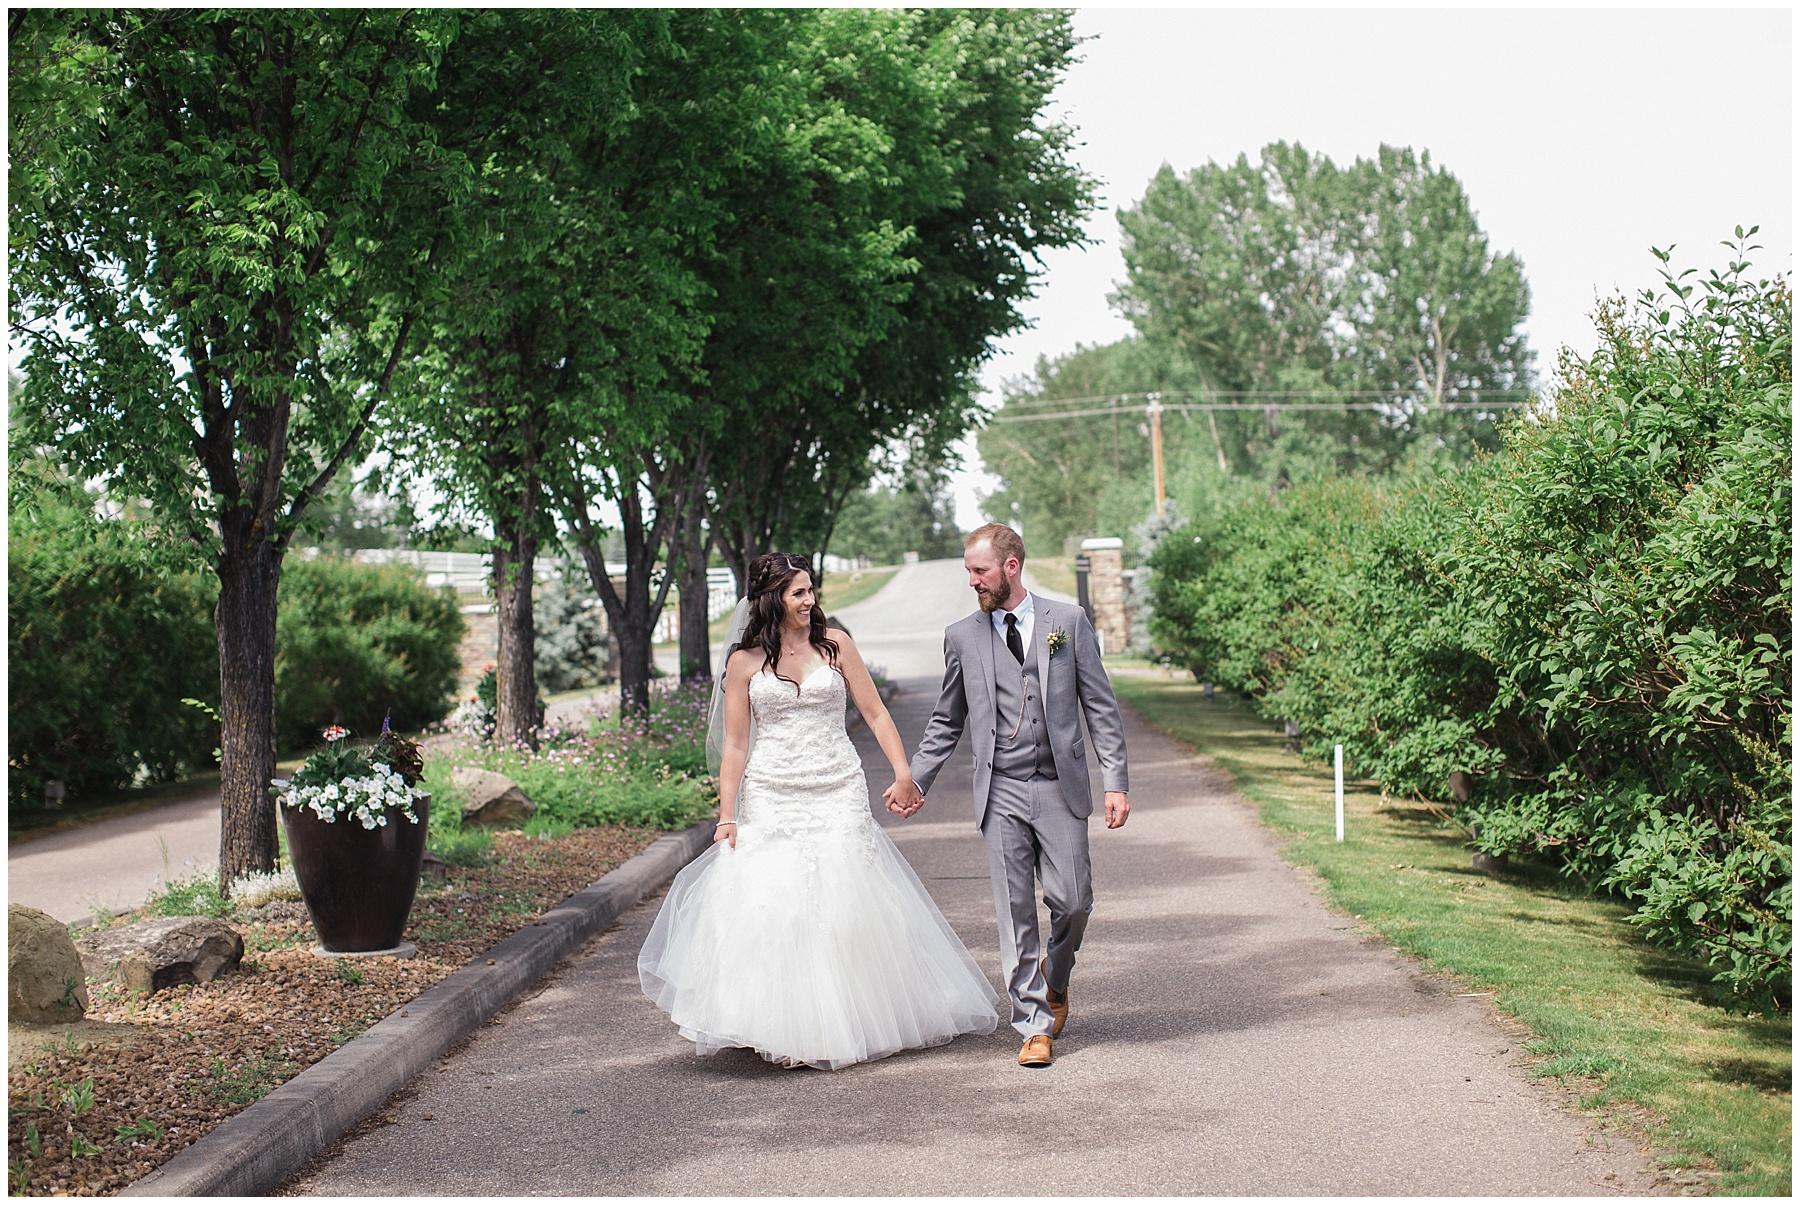 Calgary_Wedding_Photography_Carnmoney_Golf_Club_07.jpg